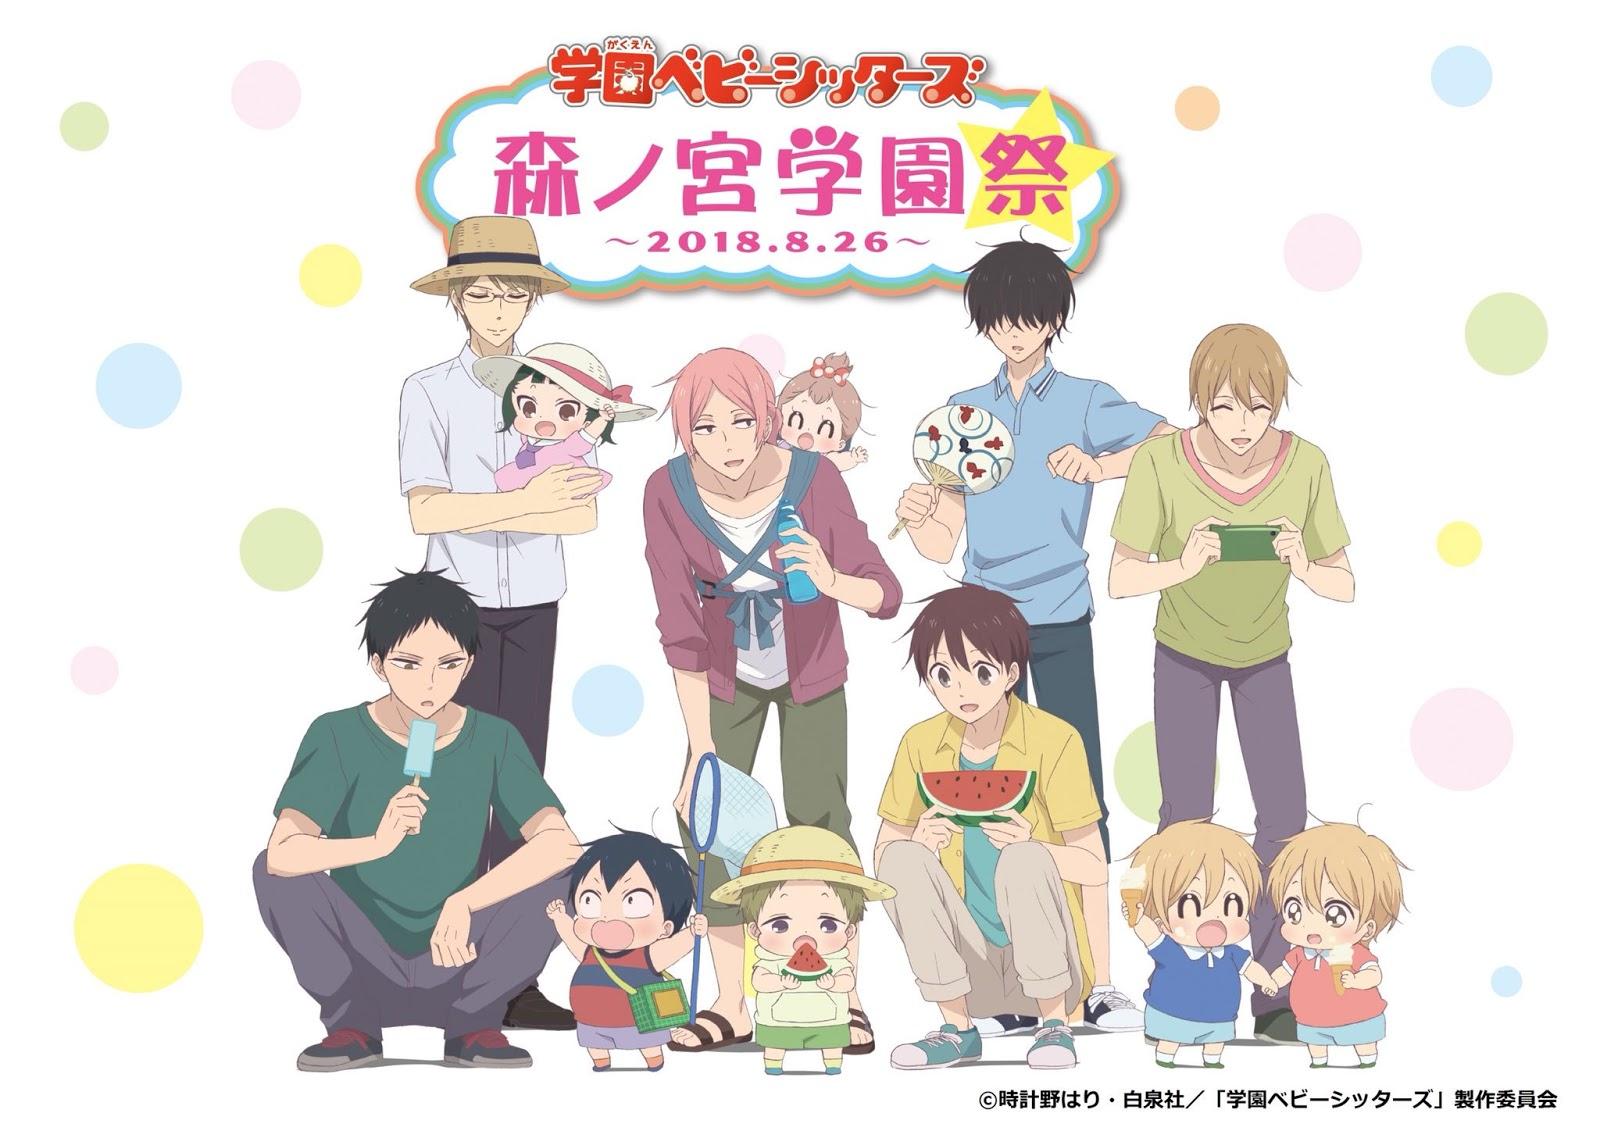 Moonlight Summoners Anime Sekai Gakuen Babysitters 学園